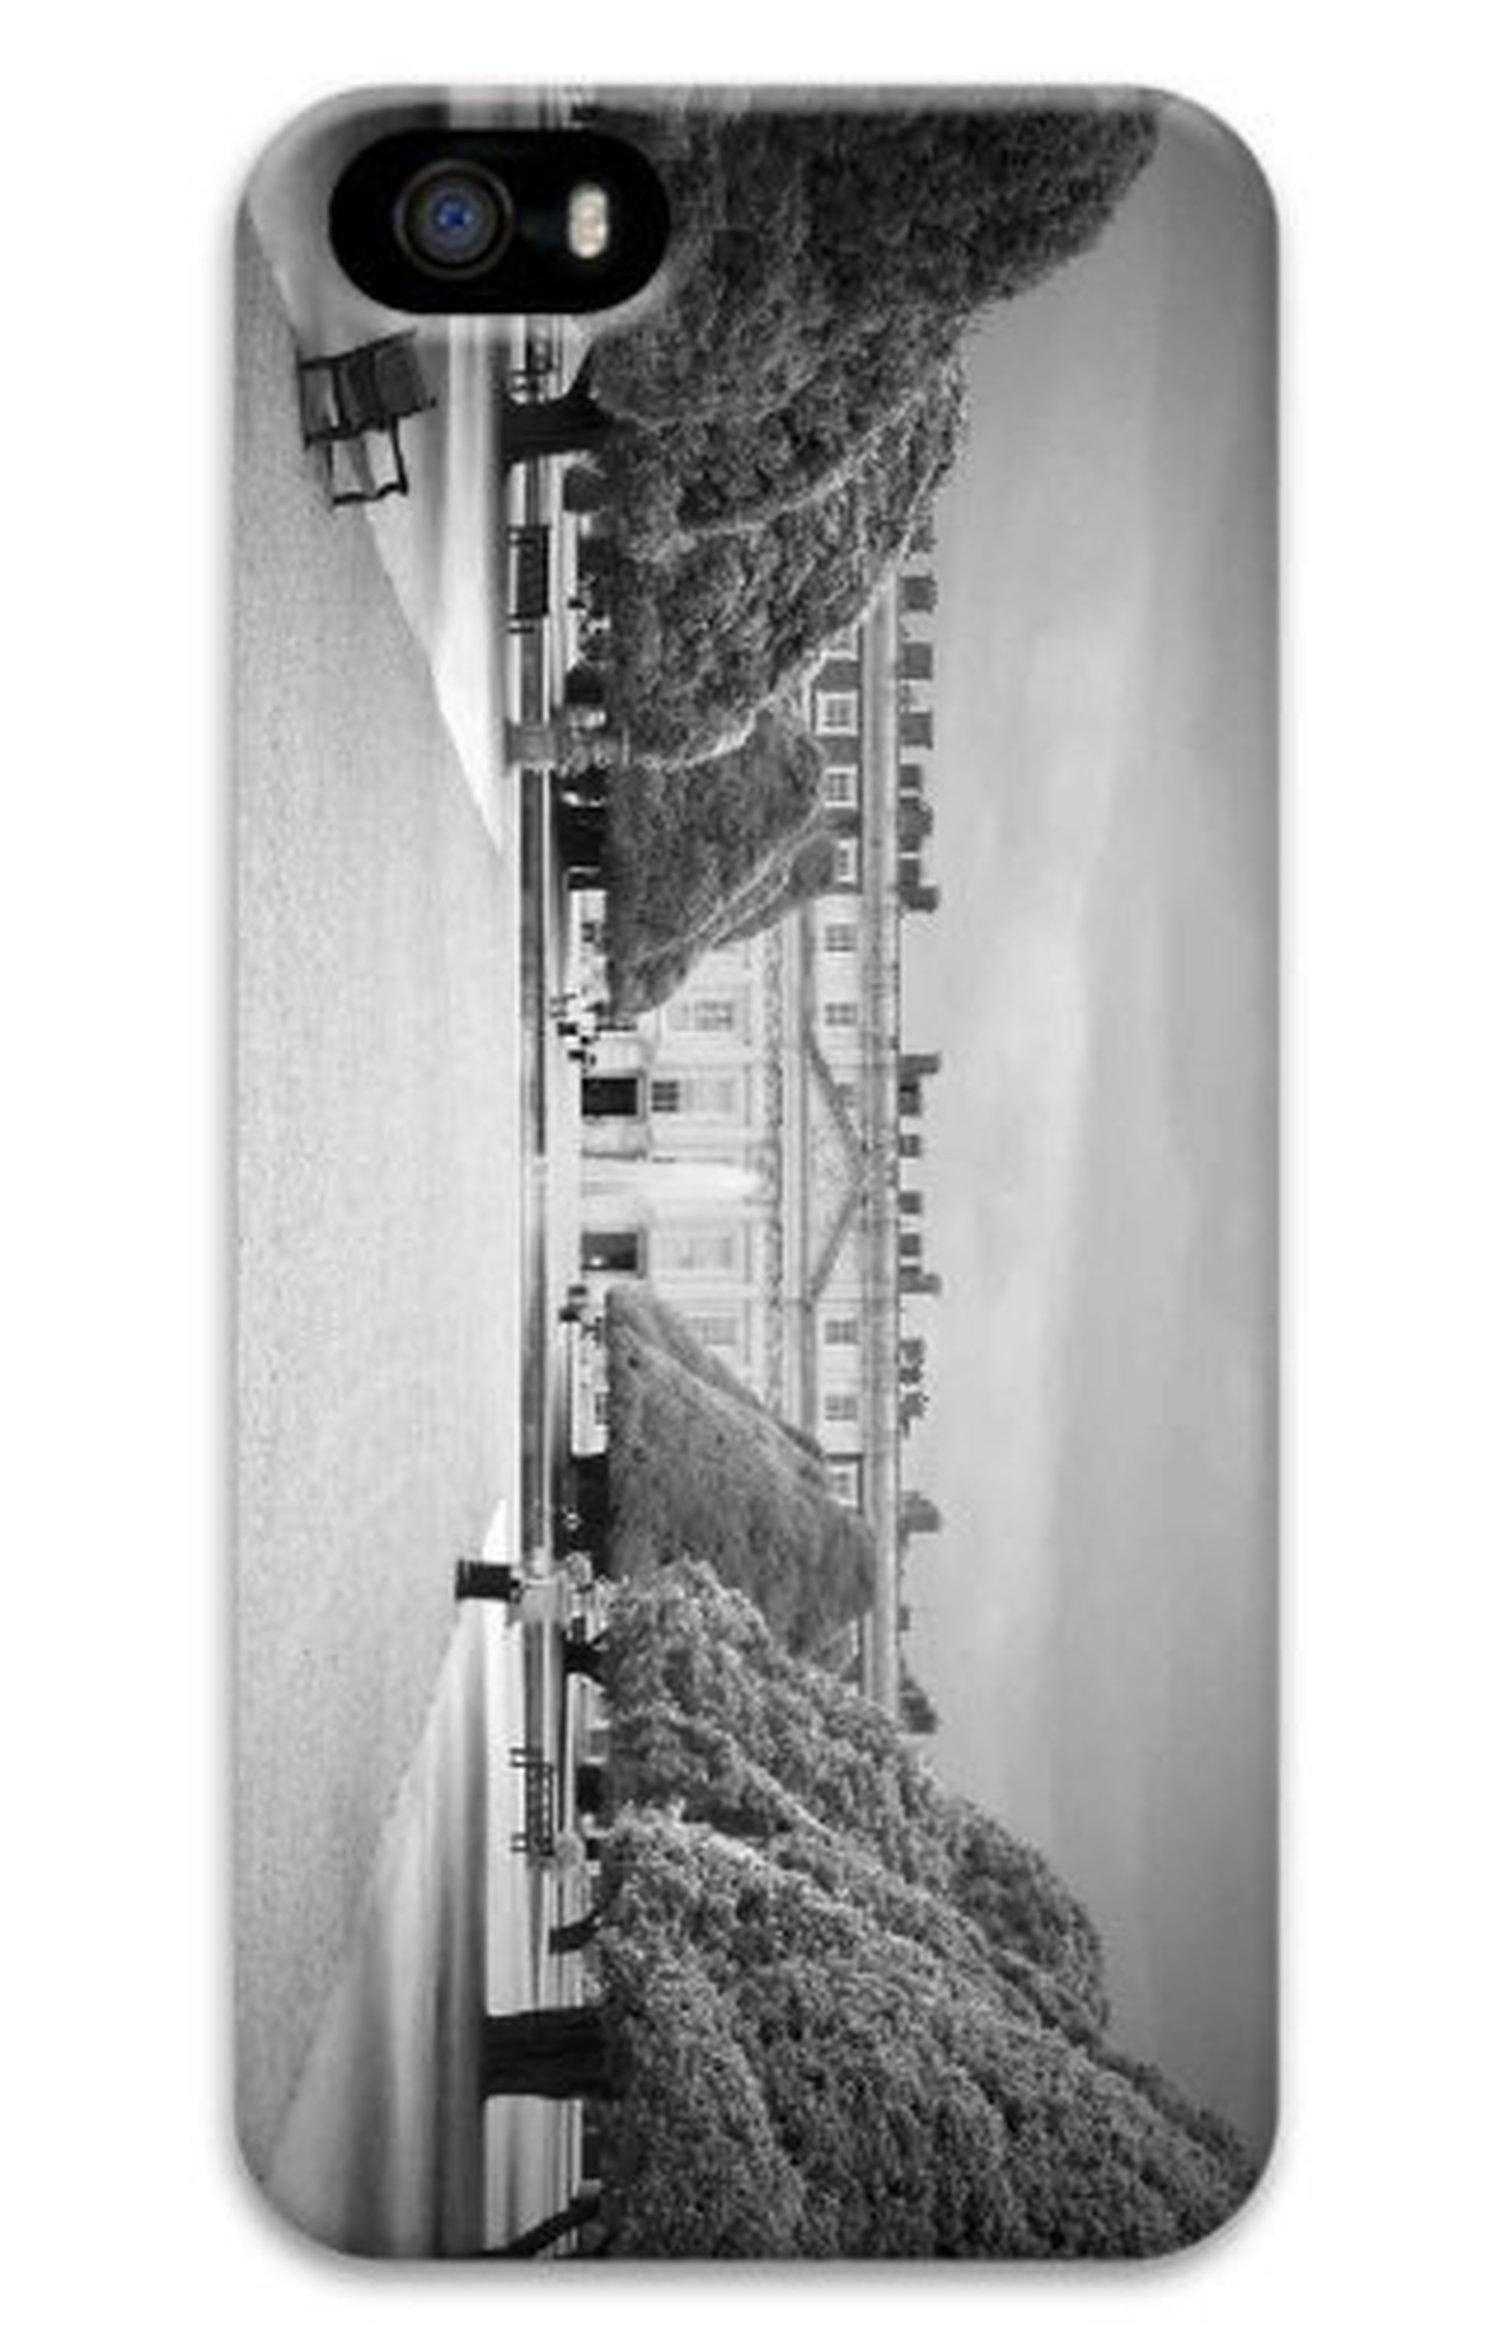 iPhone 5S Case Customized Unique Print Design Hampton Court Palace Bw iPhone 5 5S